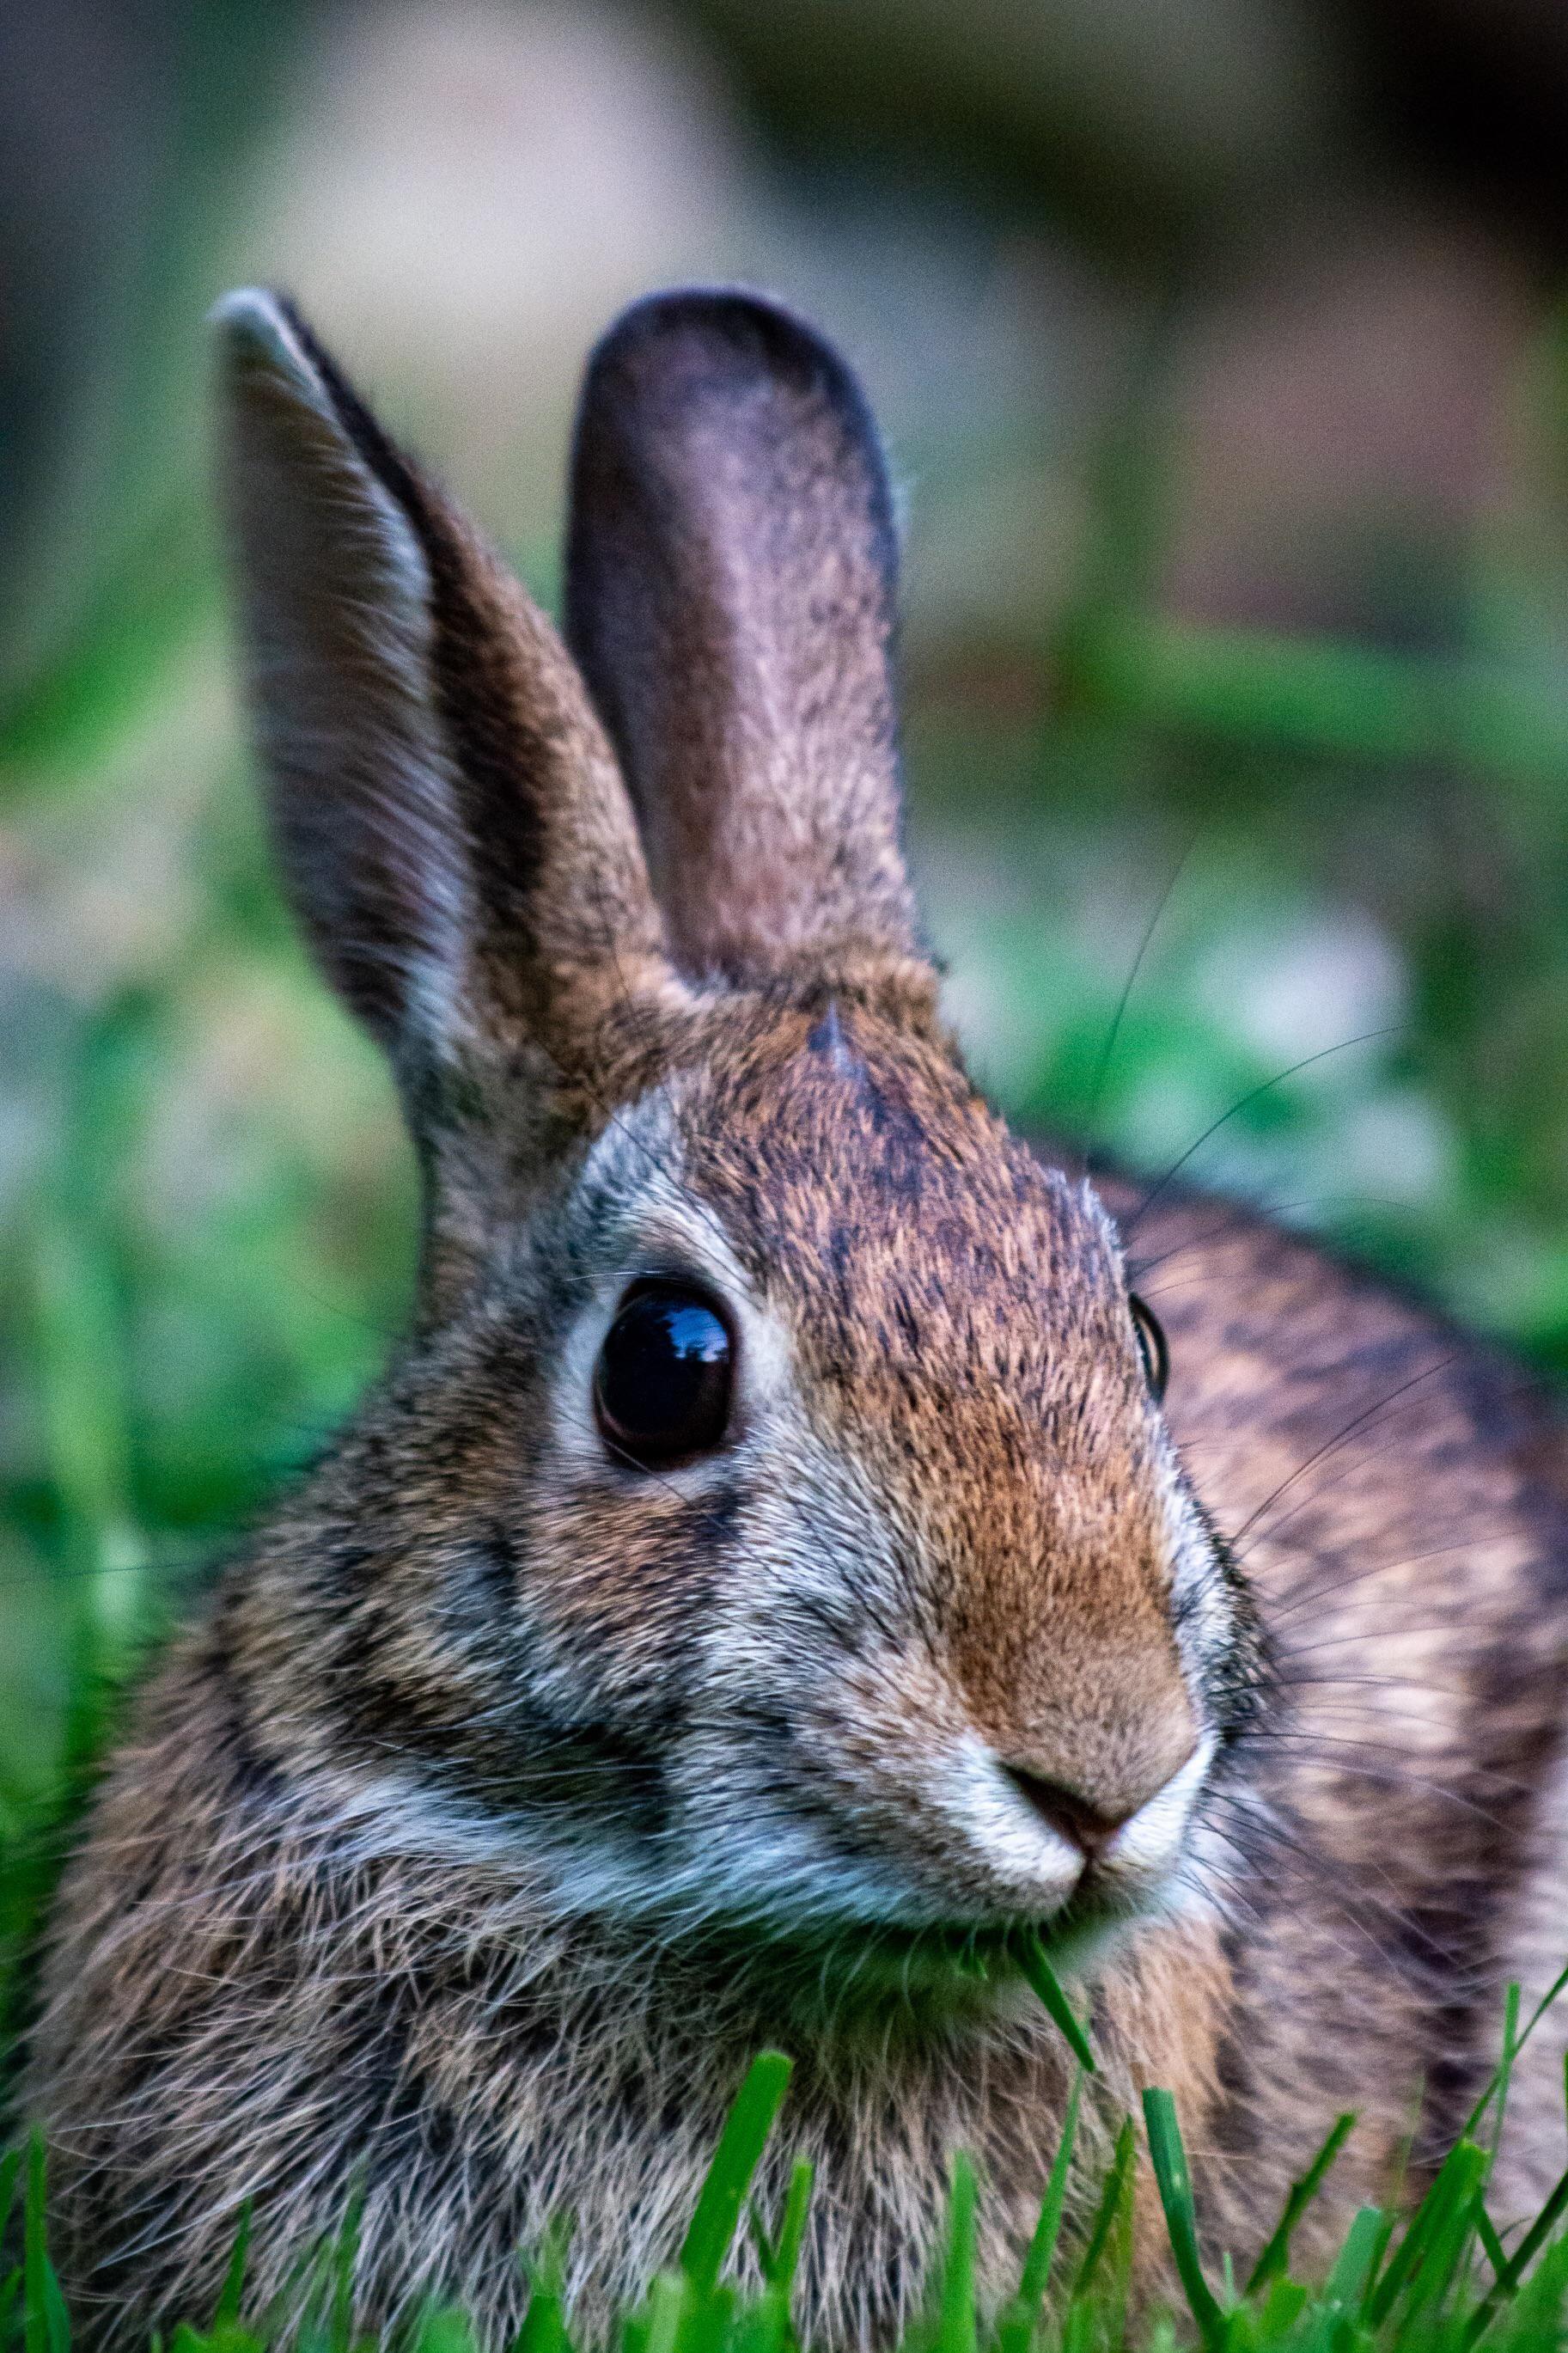 My backyard rabbit #animals #nature #photography in 2020 ...